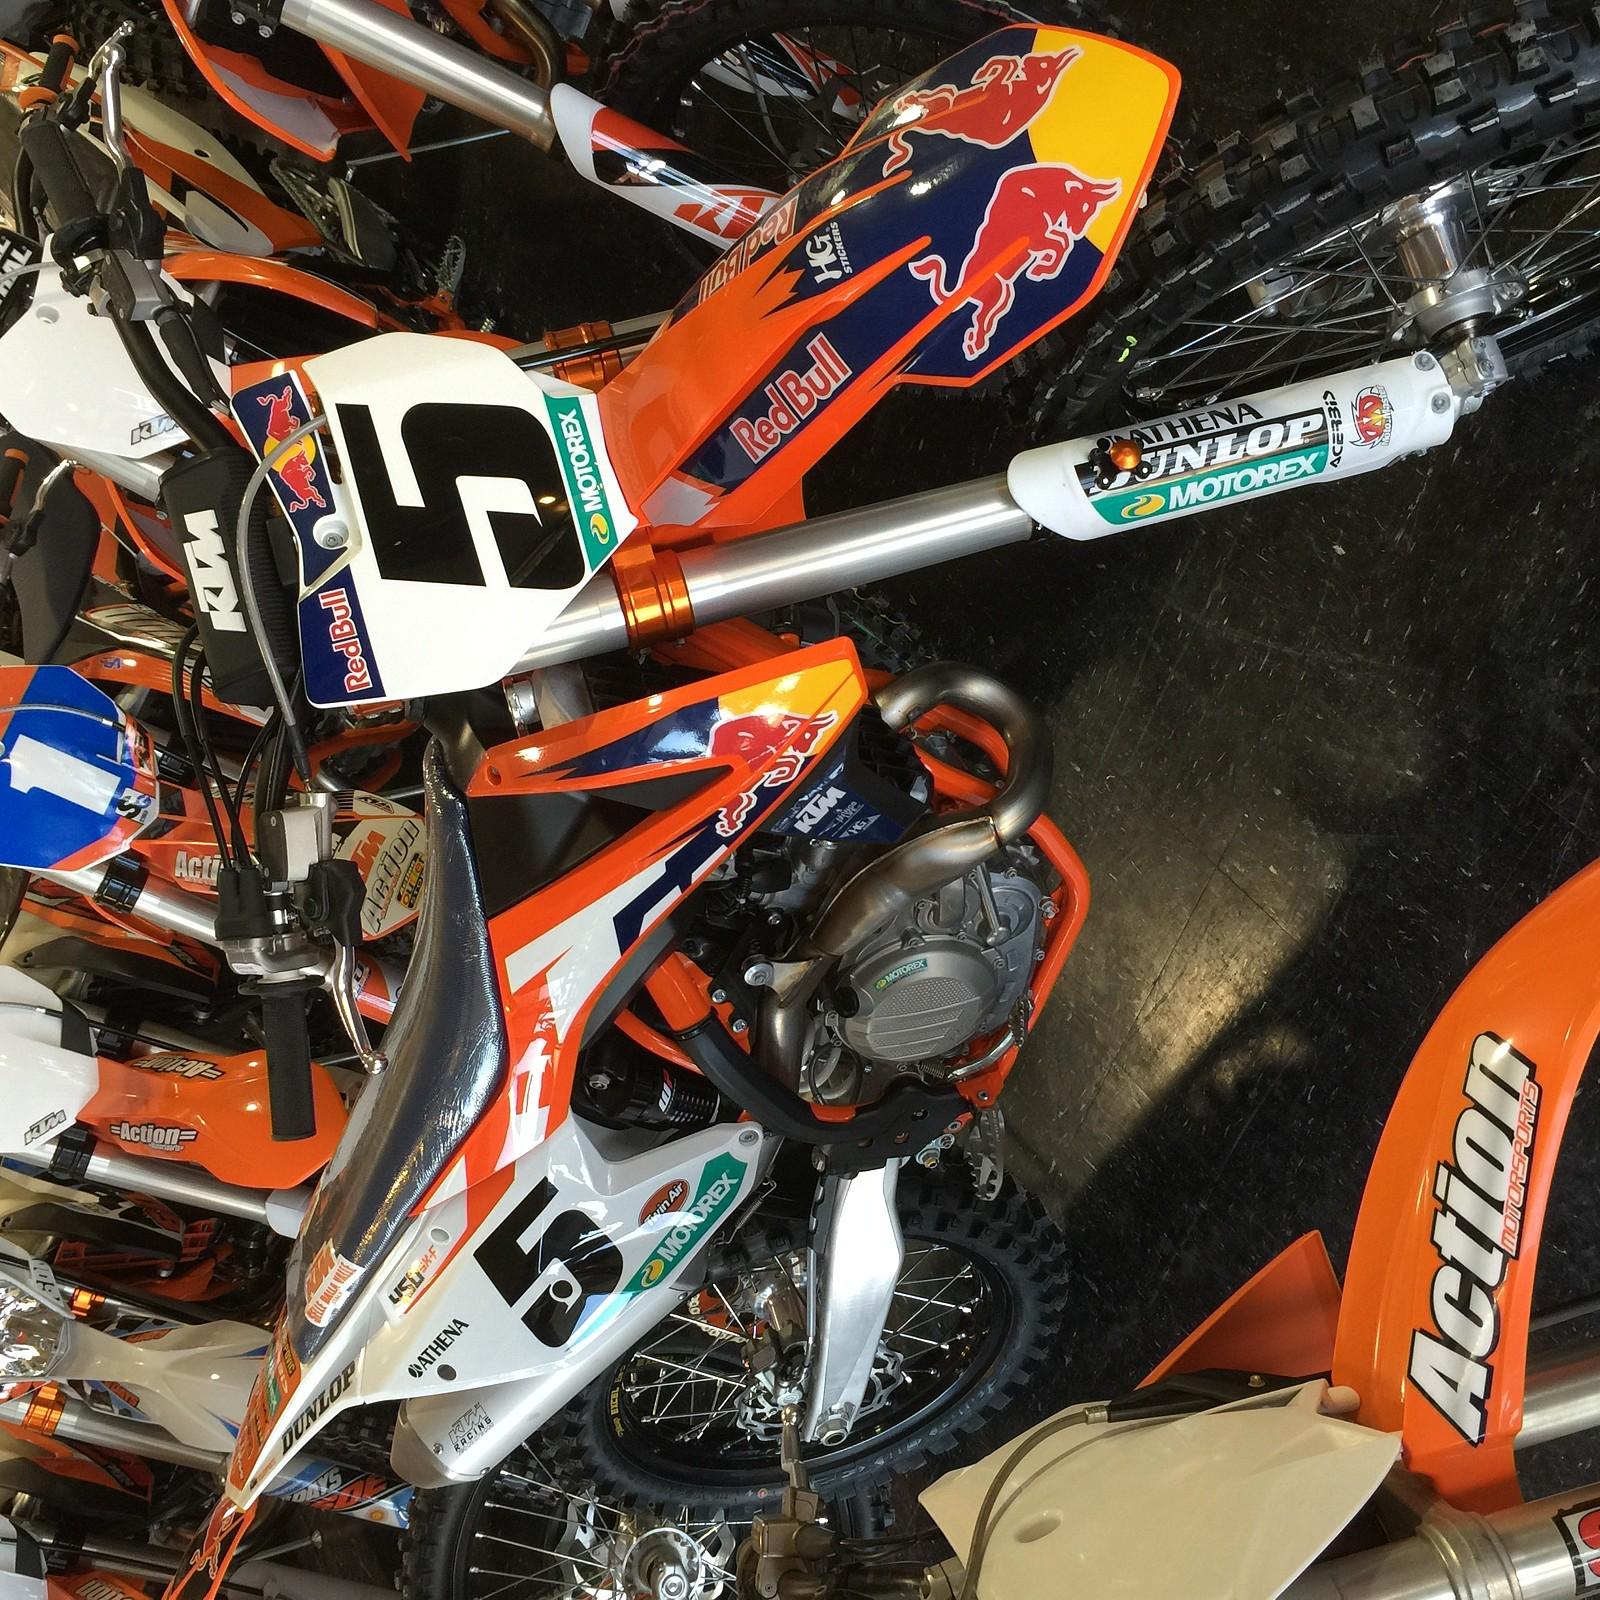 4A49ECEA-B7C7-4929-AF30-F7B48503FACA - Paul333 - Motocross Pictures - Vital MX